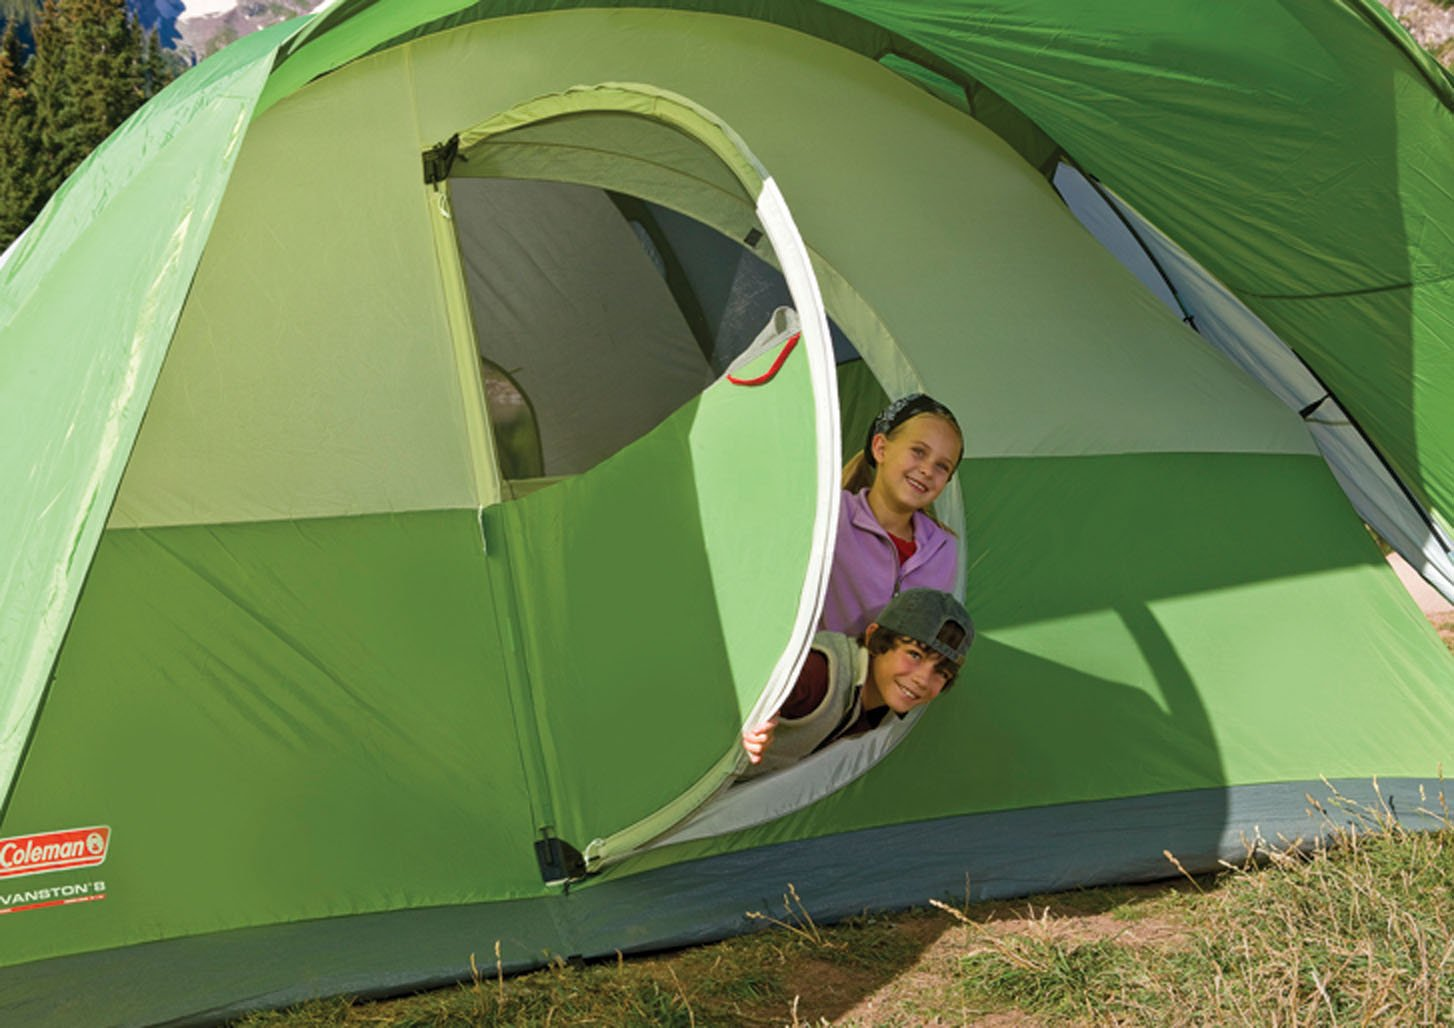 Coleman MontanaCamping Tent Black Friday 2020 Deals